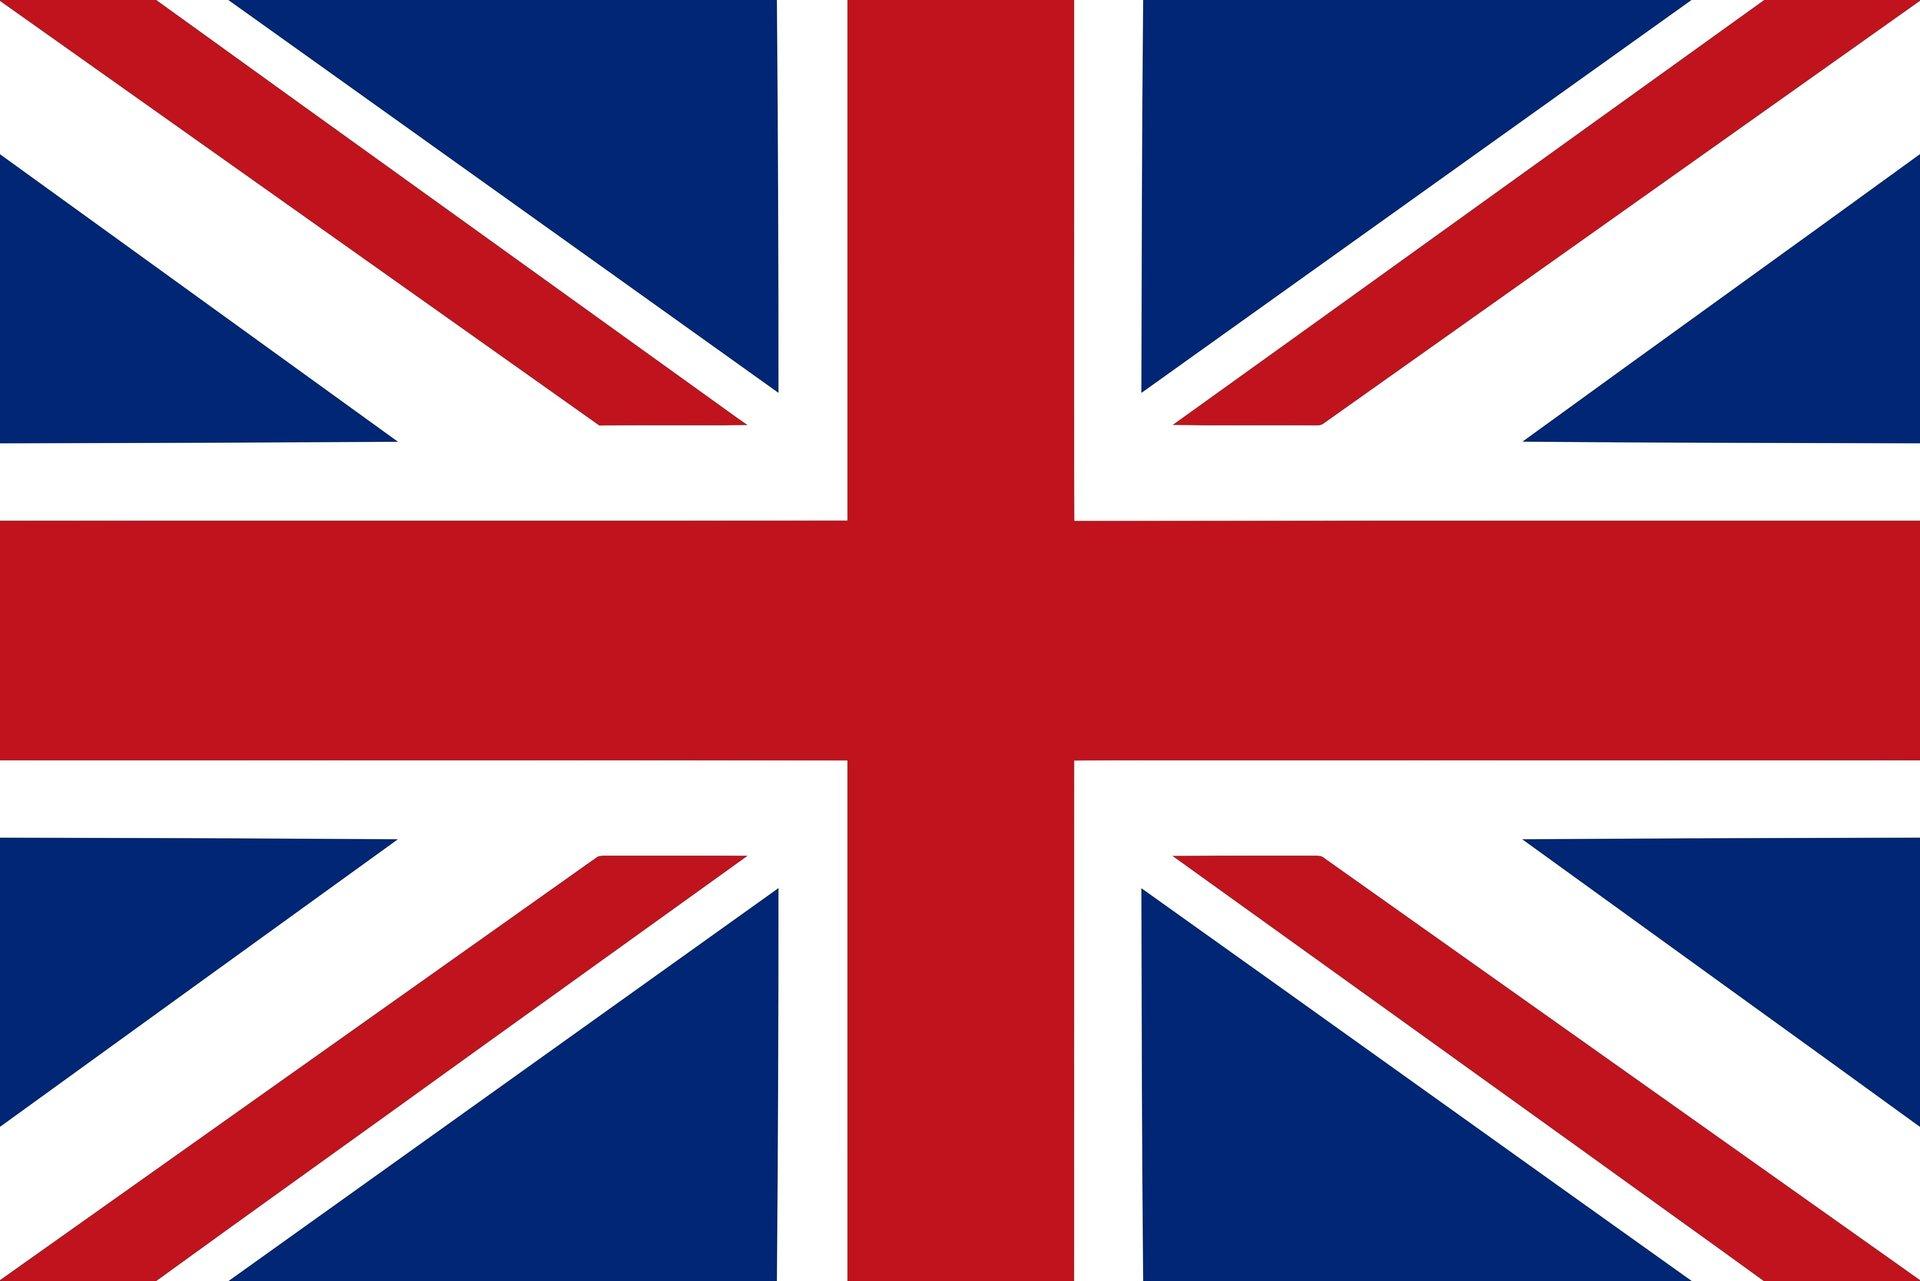 Bandiera d'Inghilterra